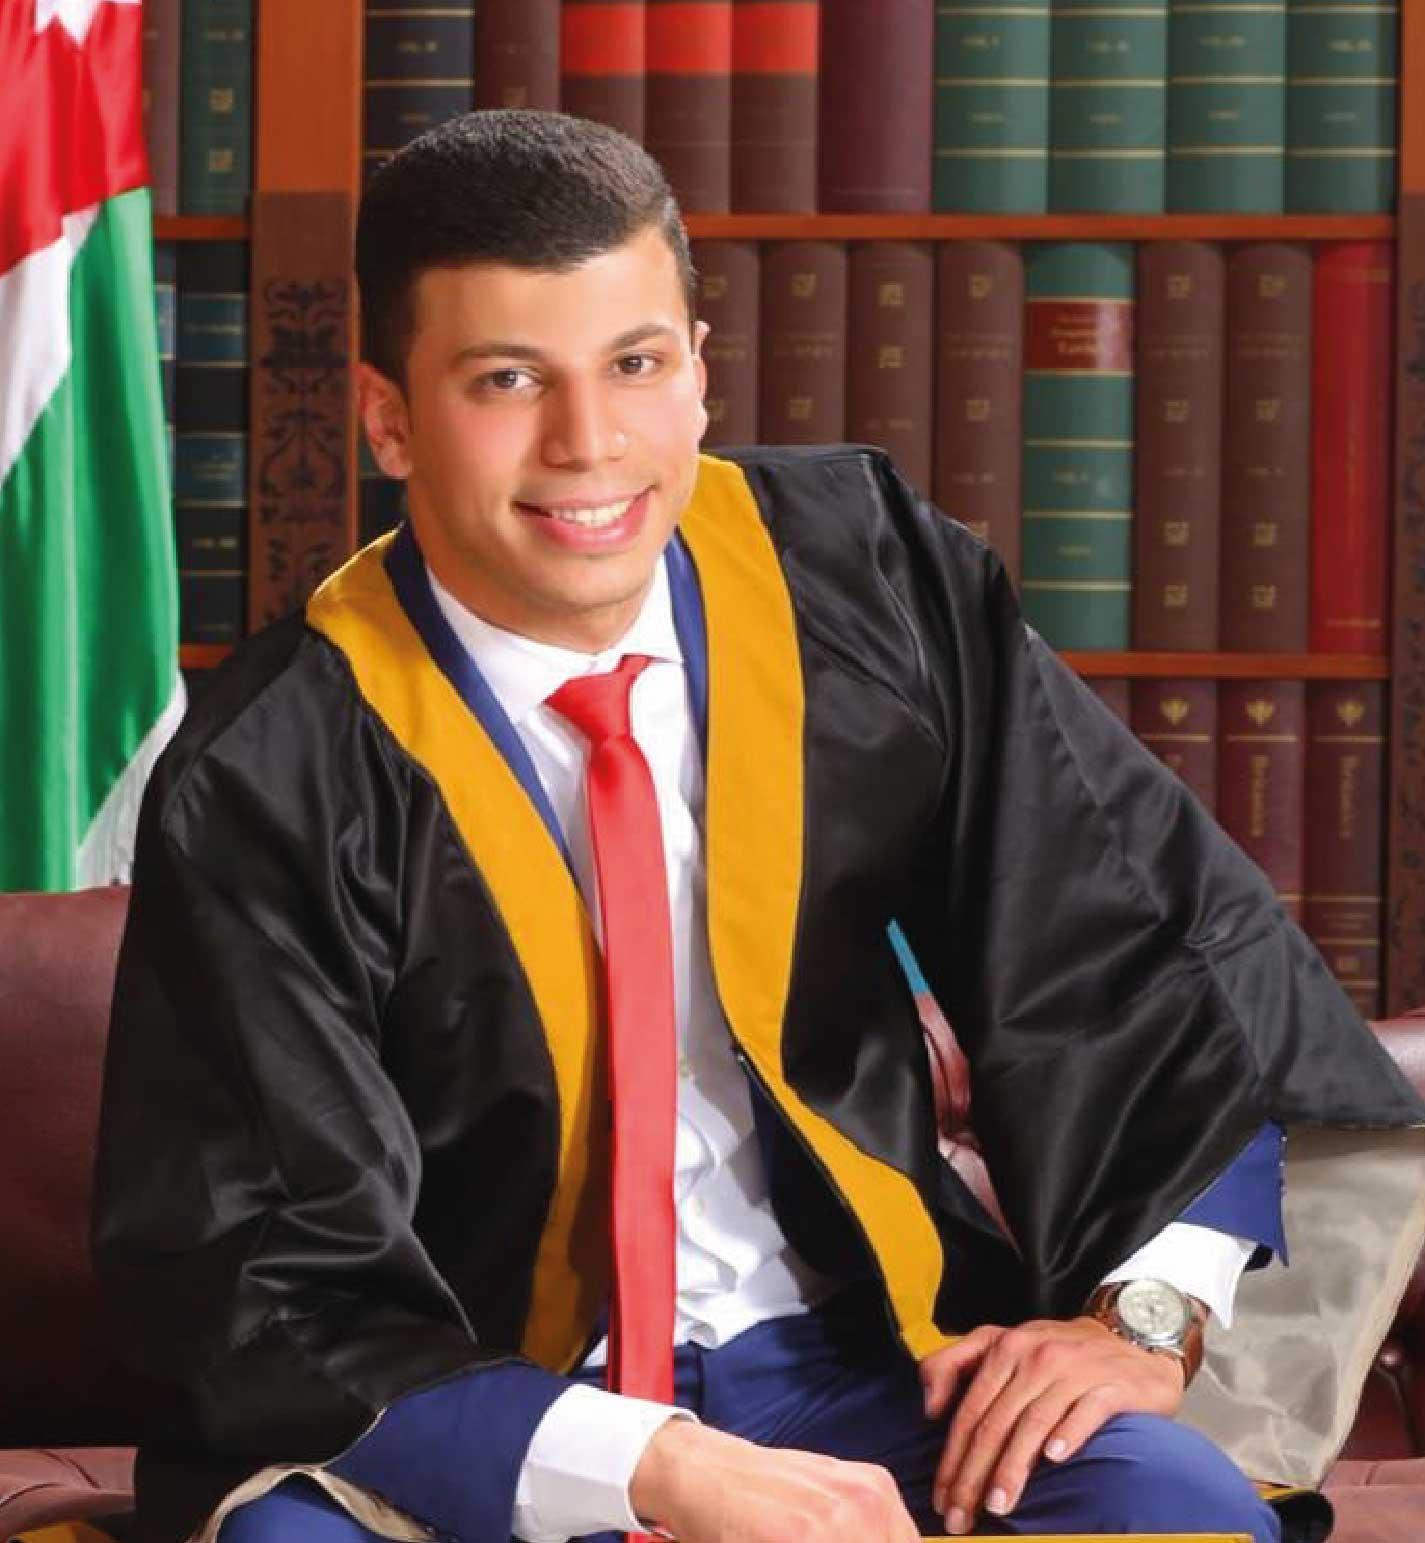 Eng. Marwan Mousa